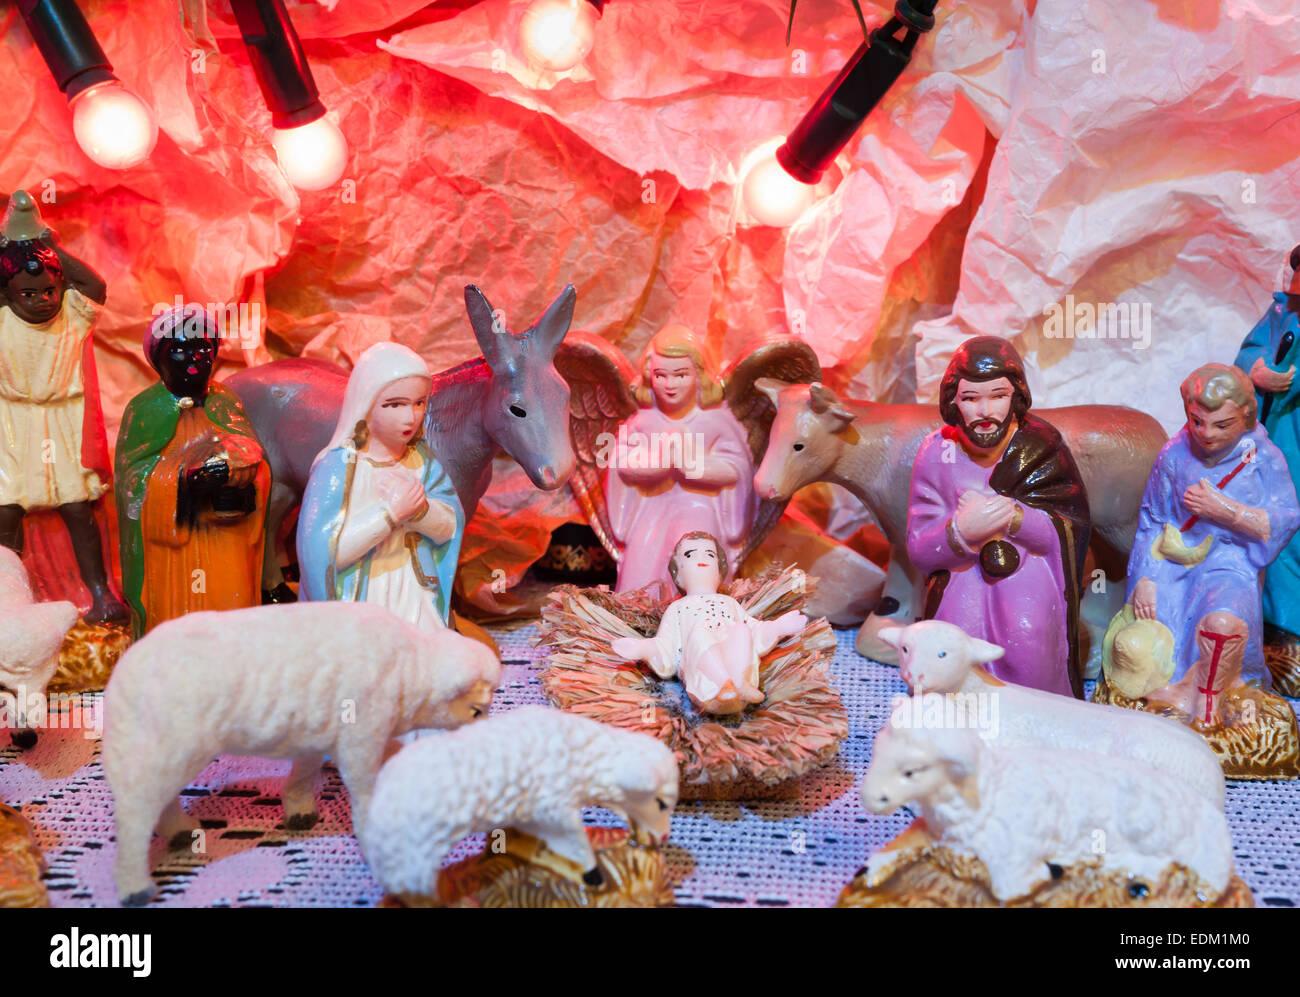 Colorful Image Jesus Child Virgin Stock Photos & Colorful Image ...